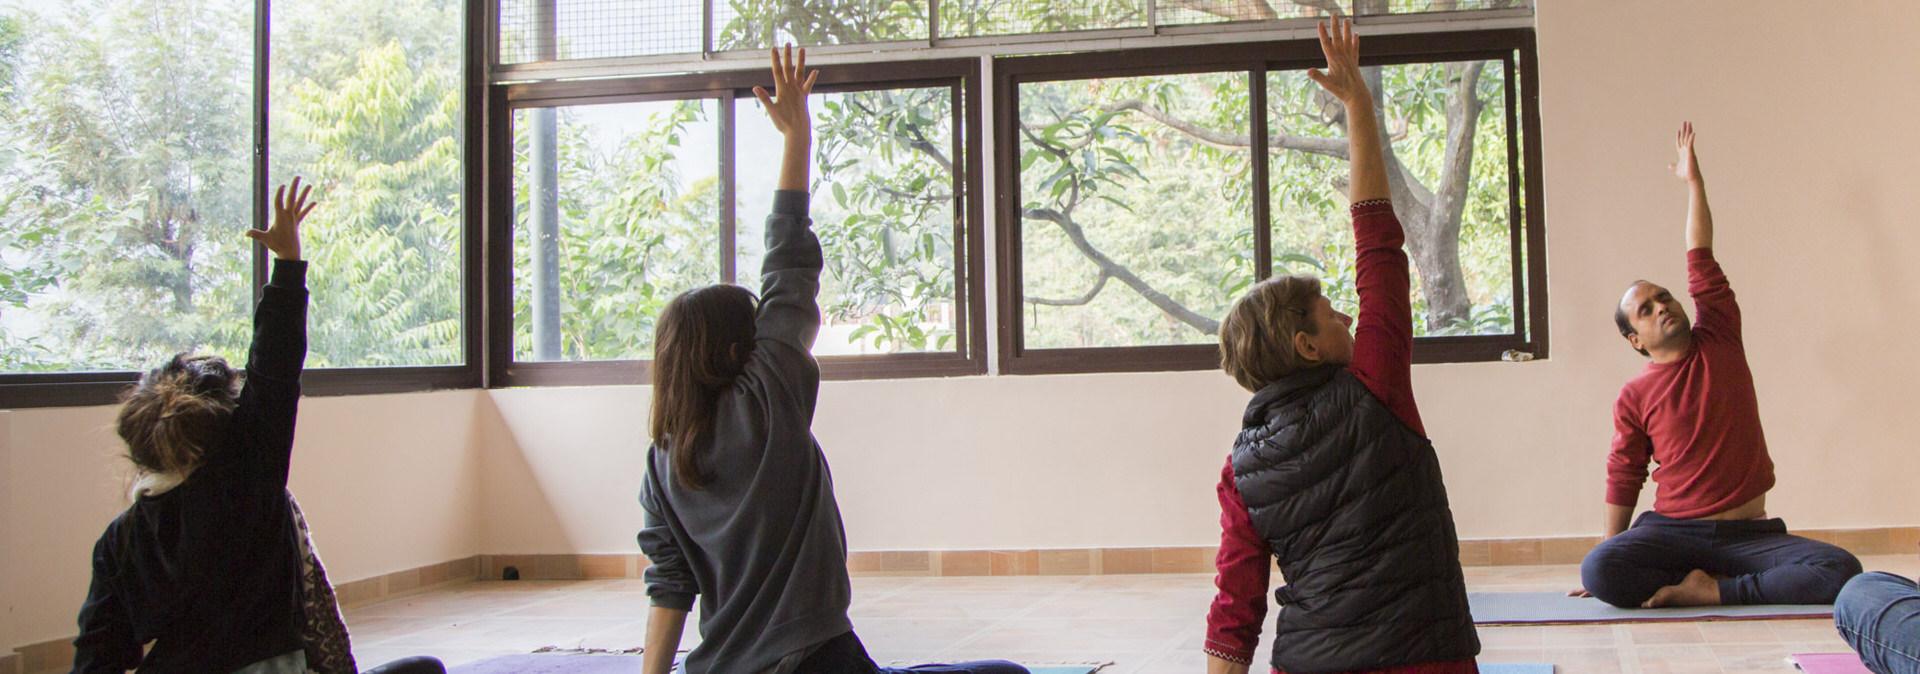 yoga-2214